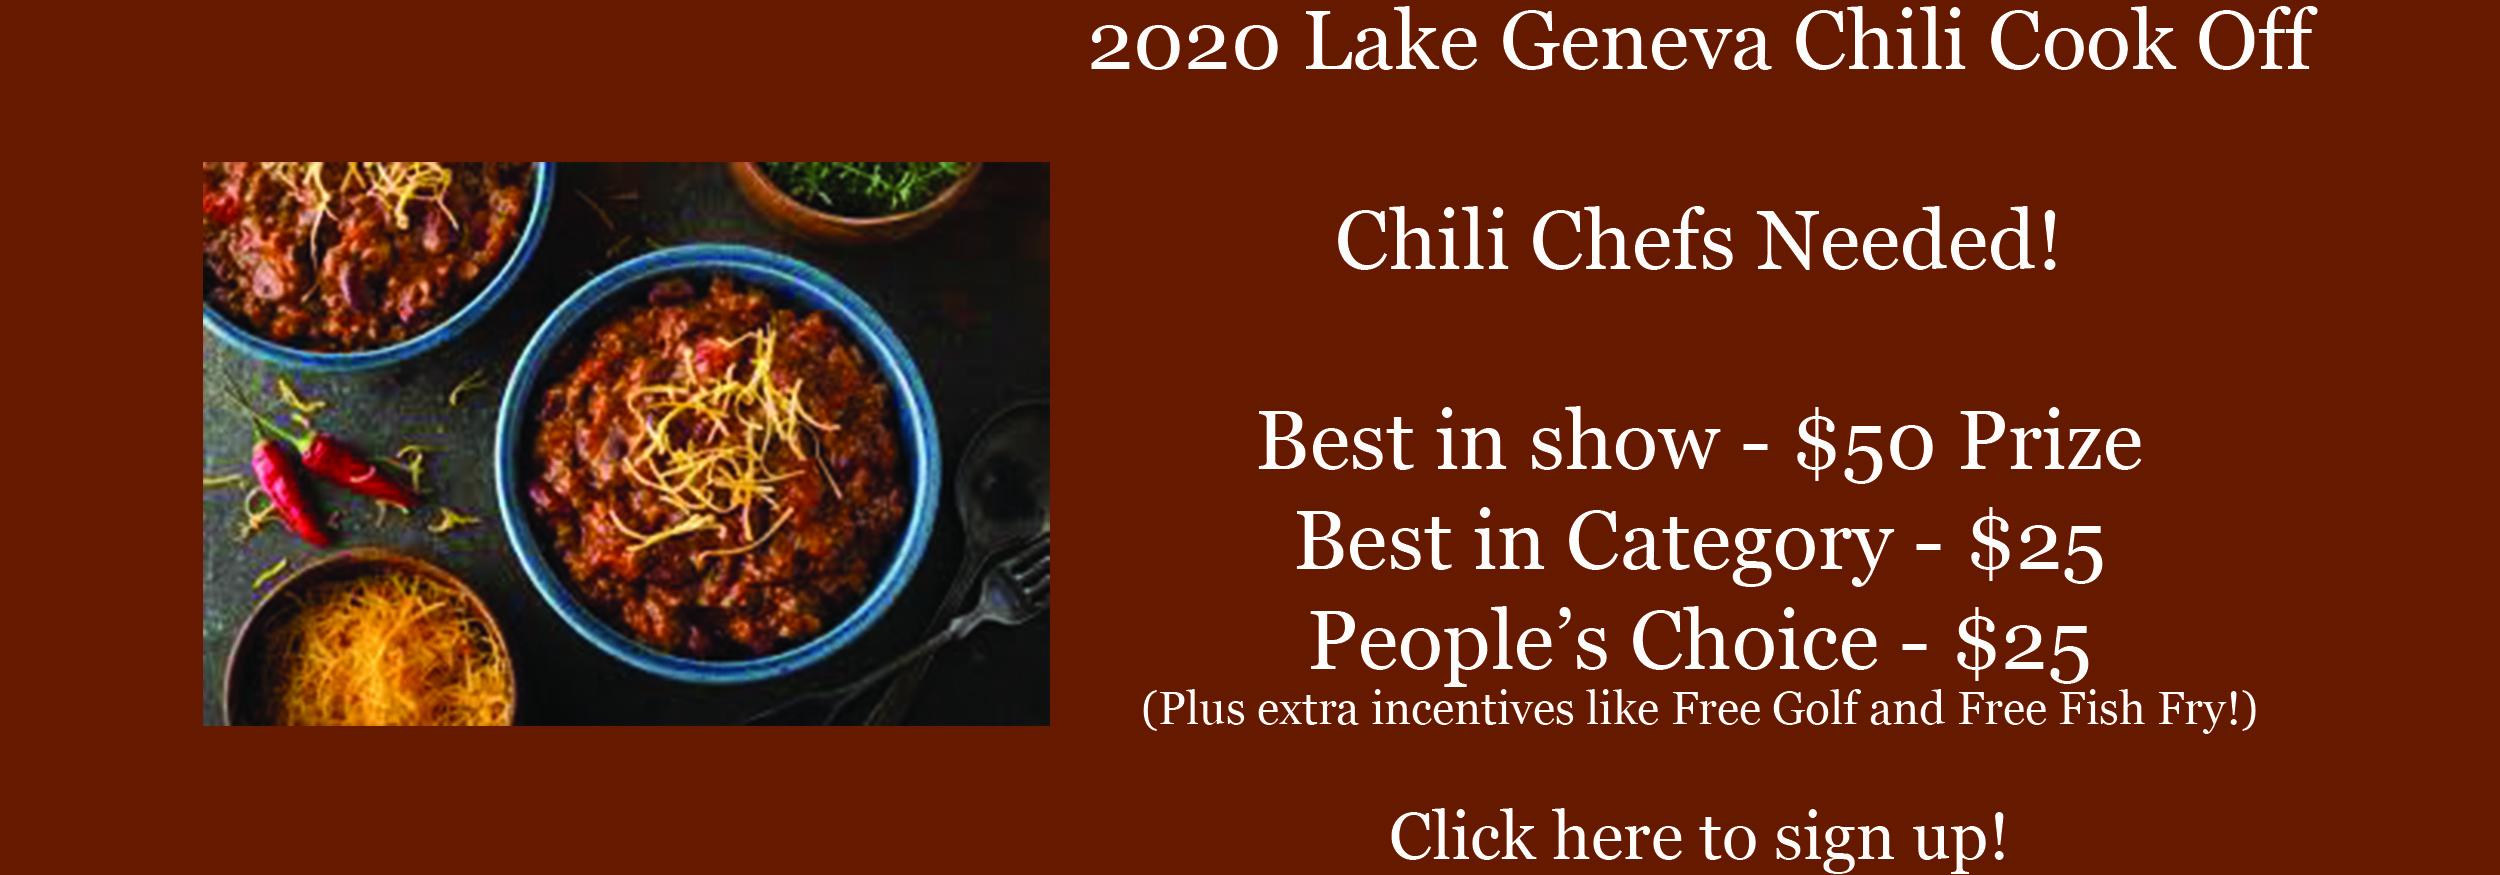 2020 Lake Geneva Chili Cook Off